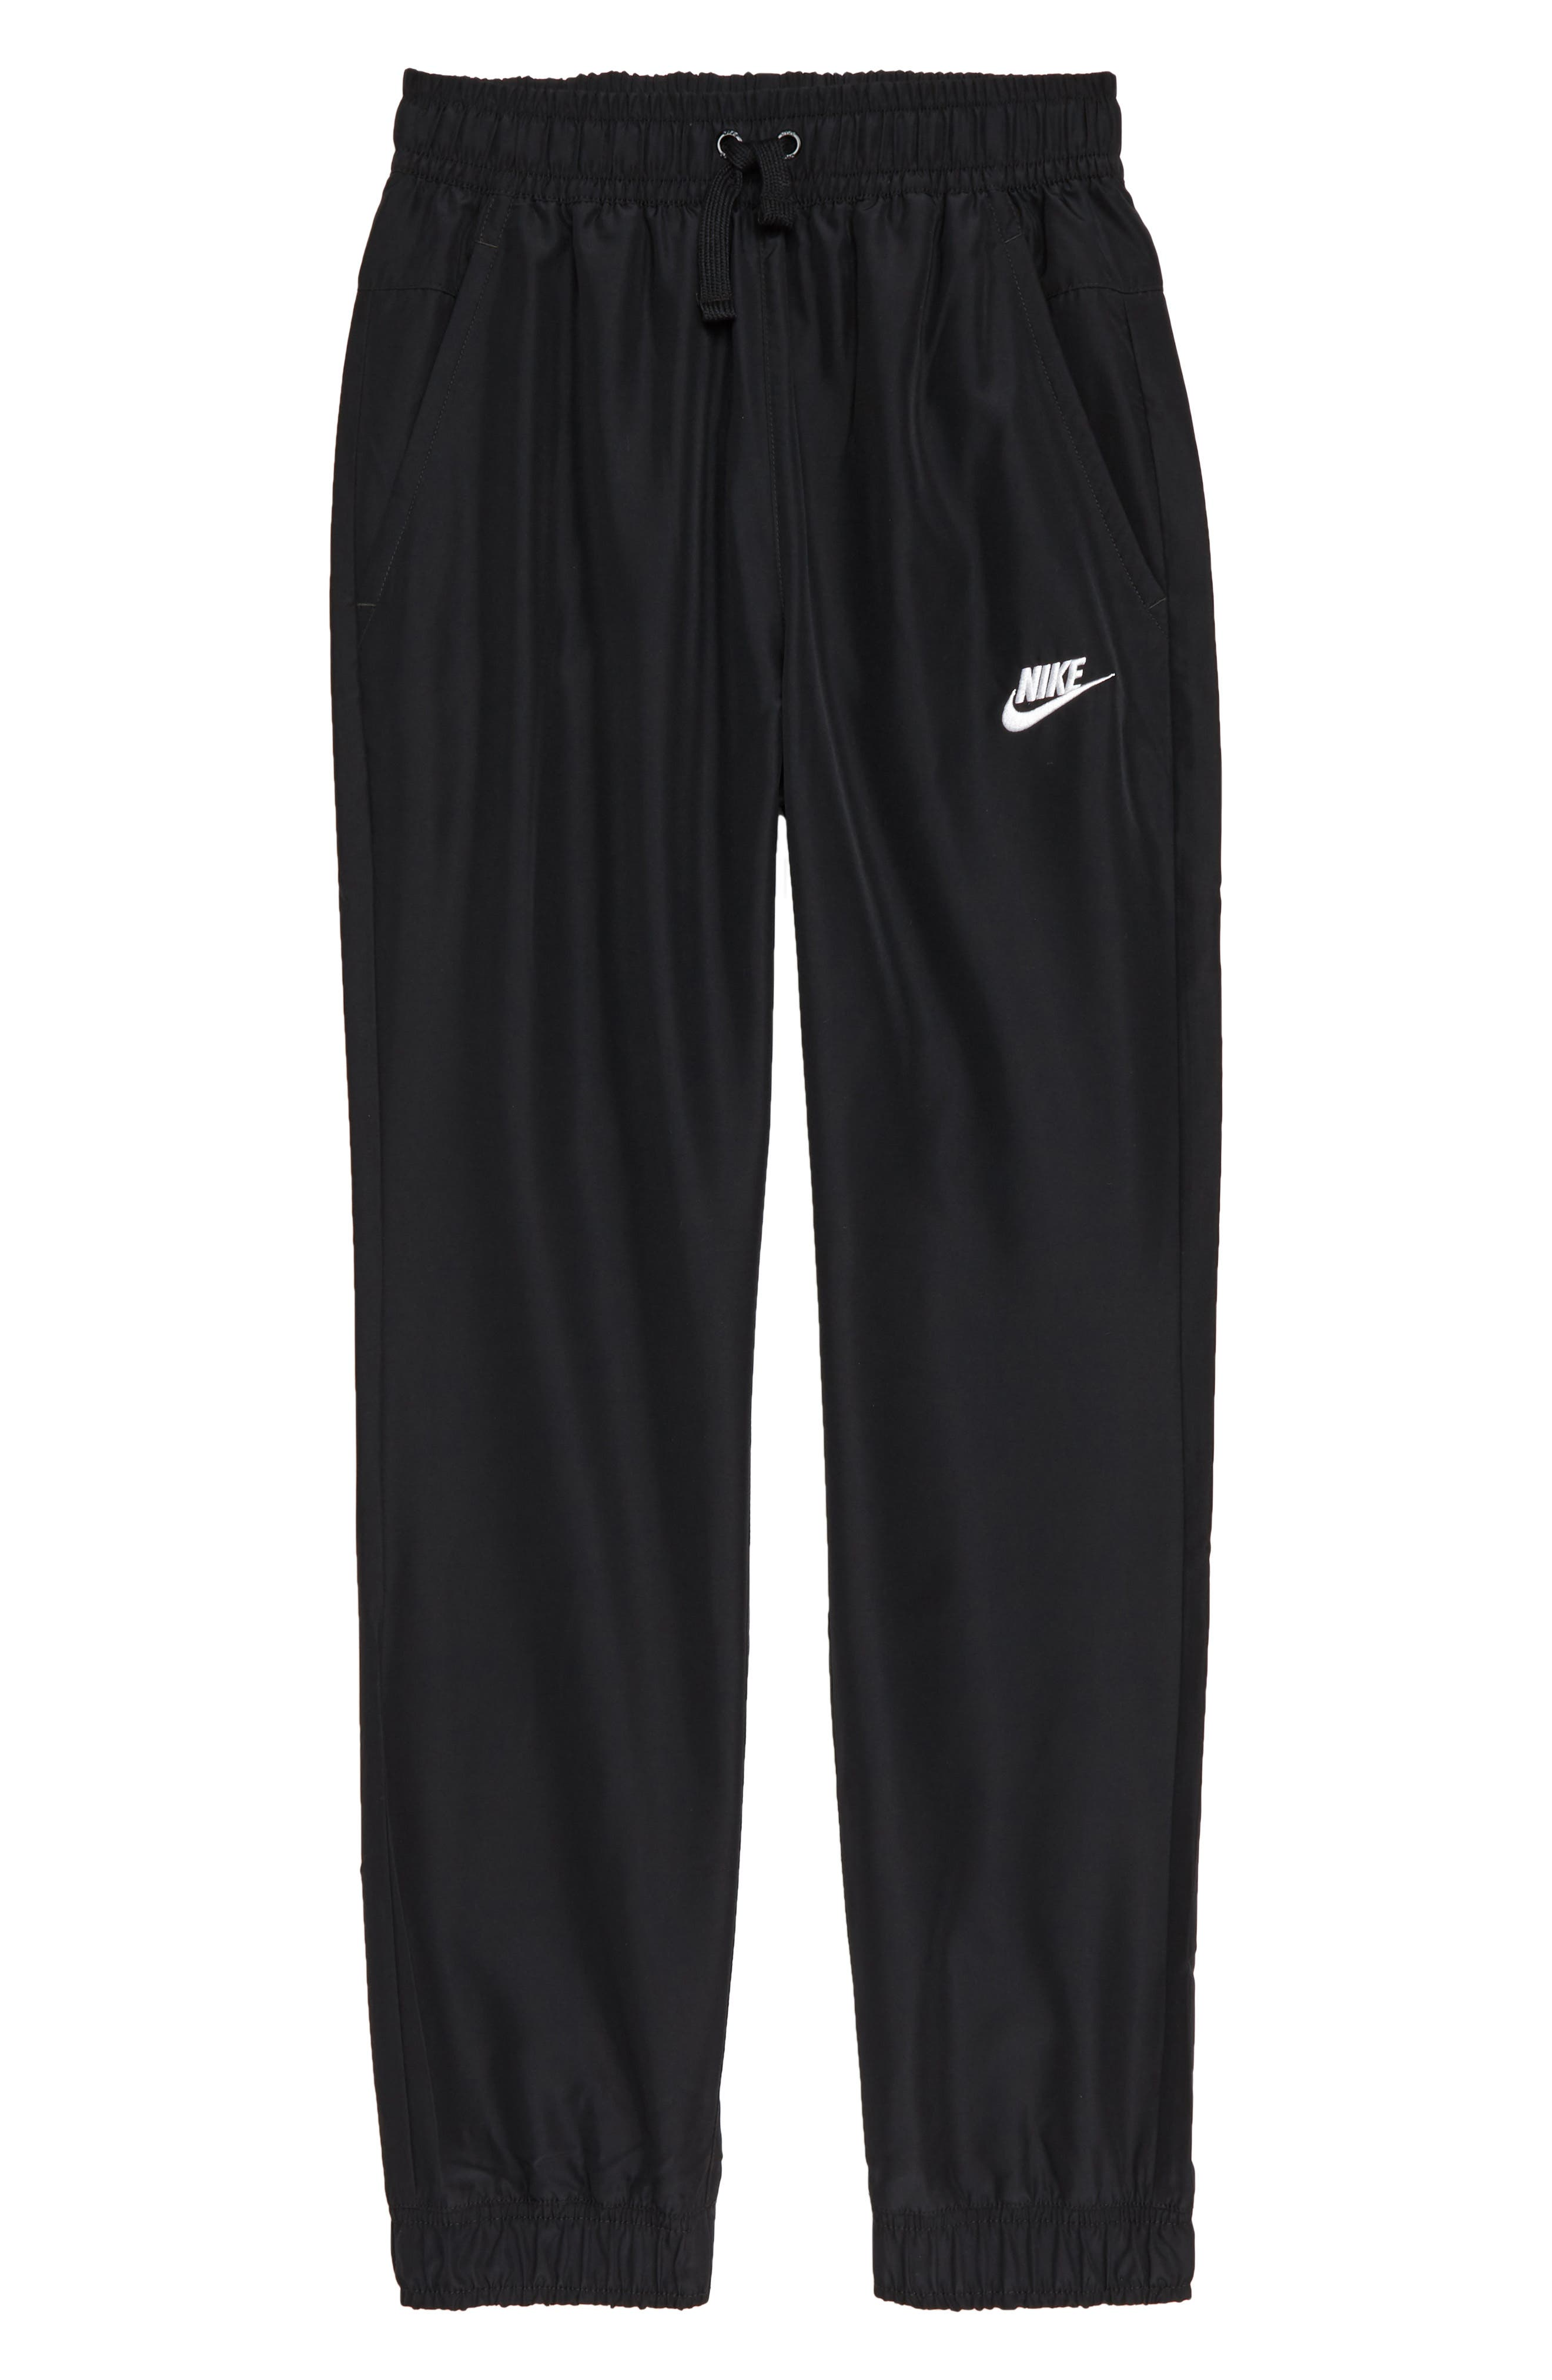 NIKE, Sportswear Woven Jogger Pants, Main thumbnail 1, color, 010